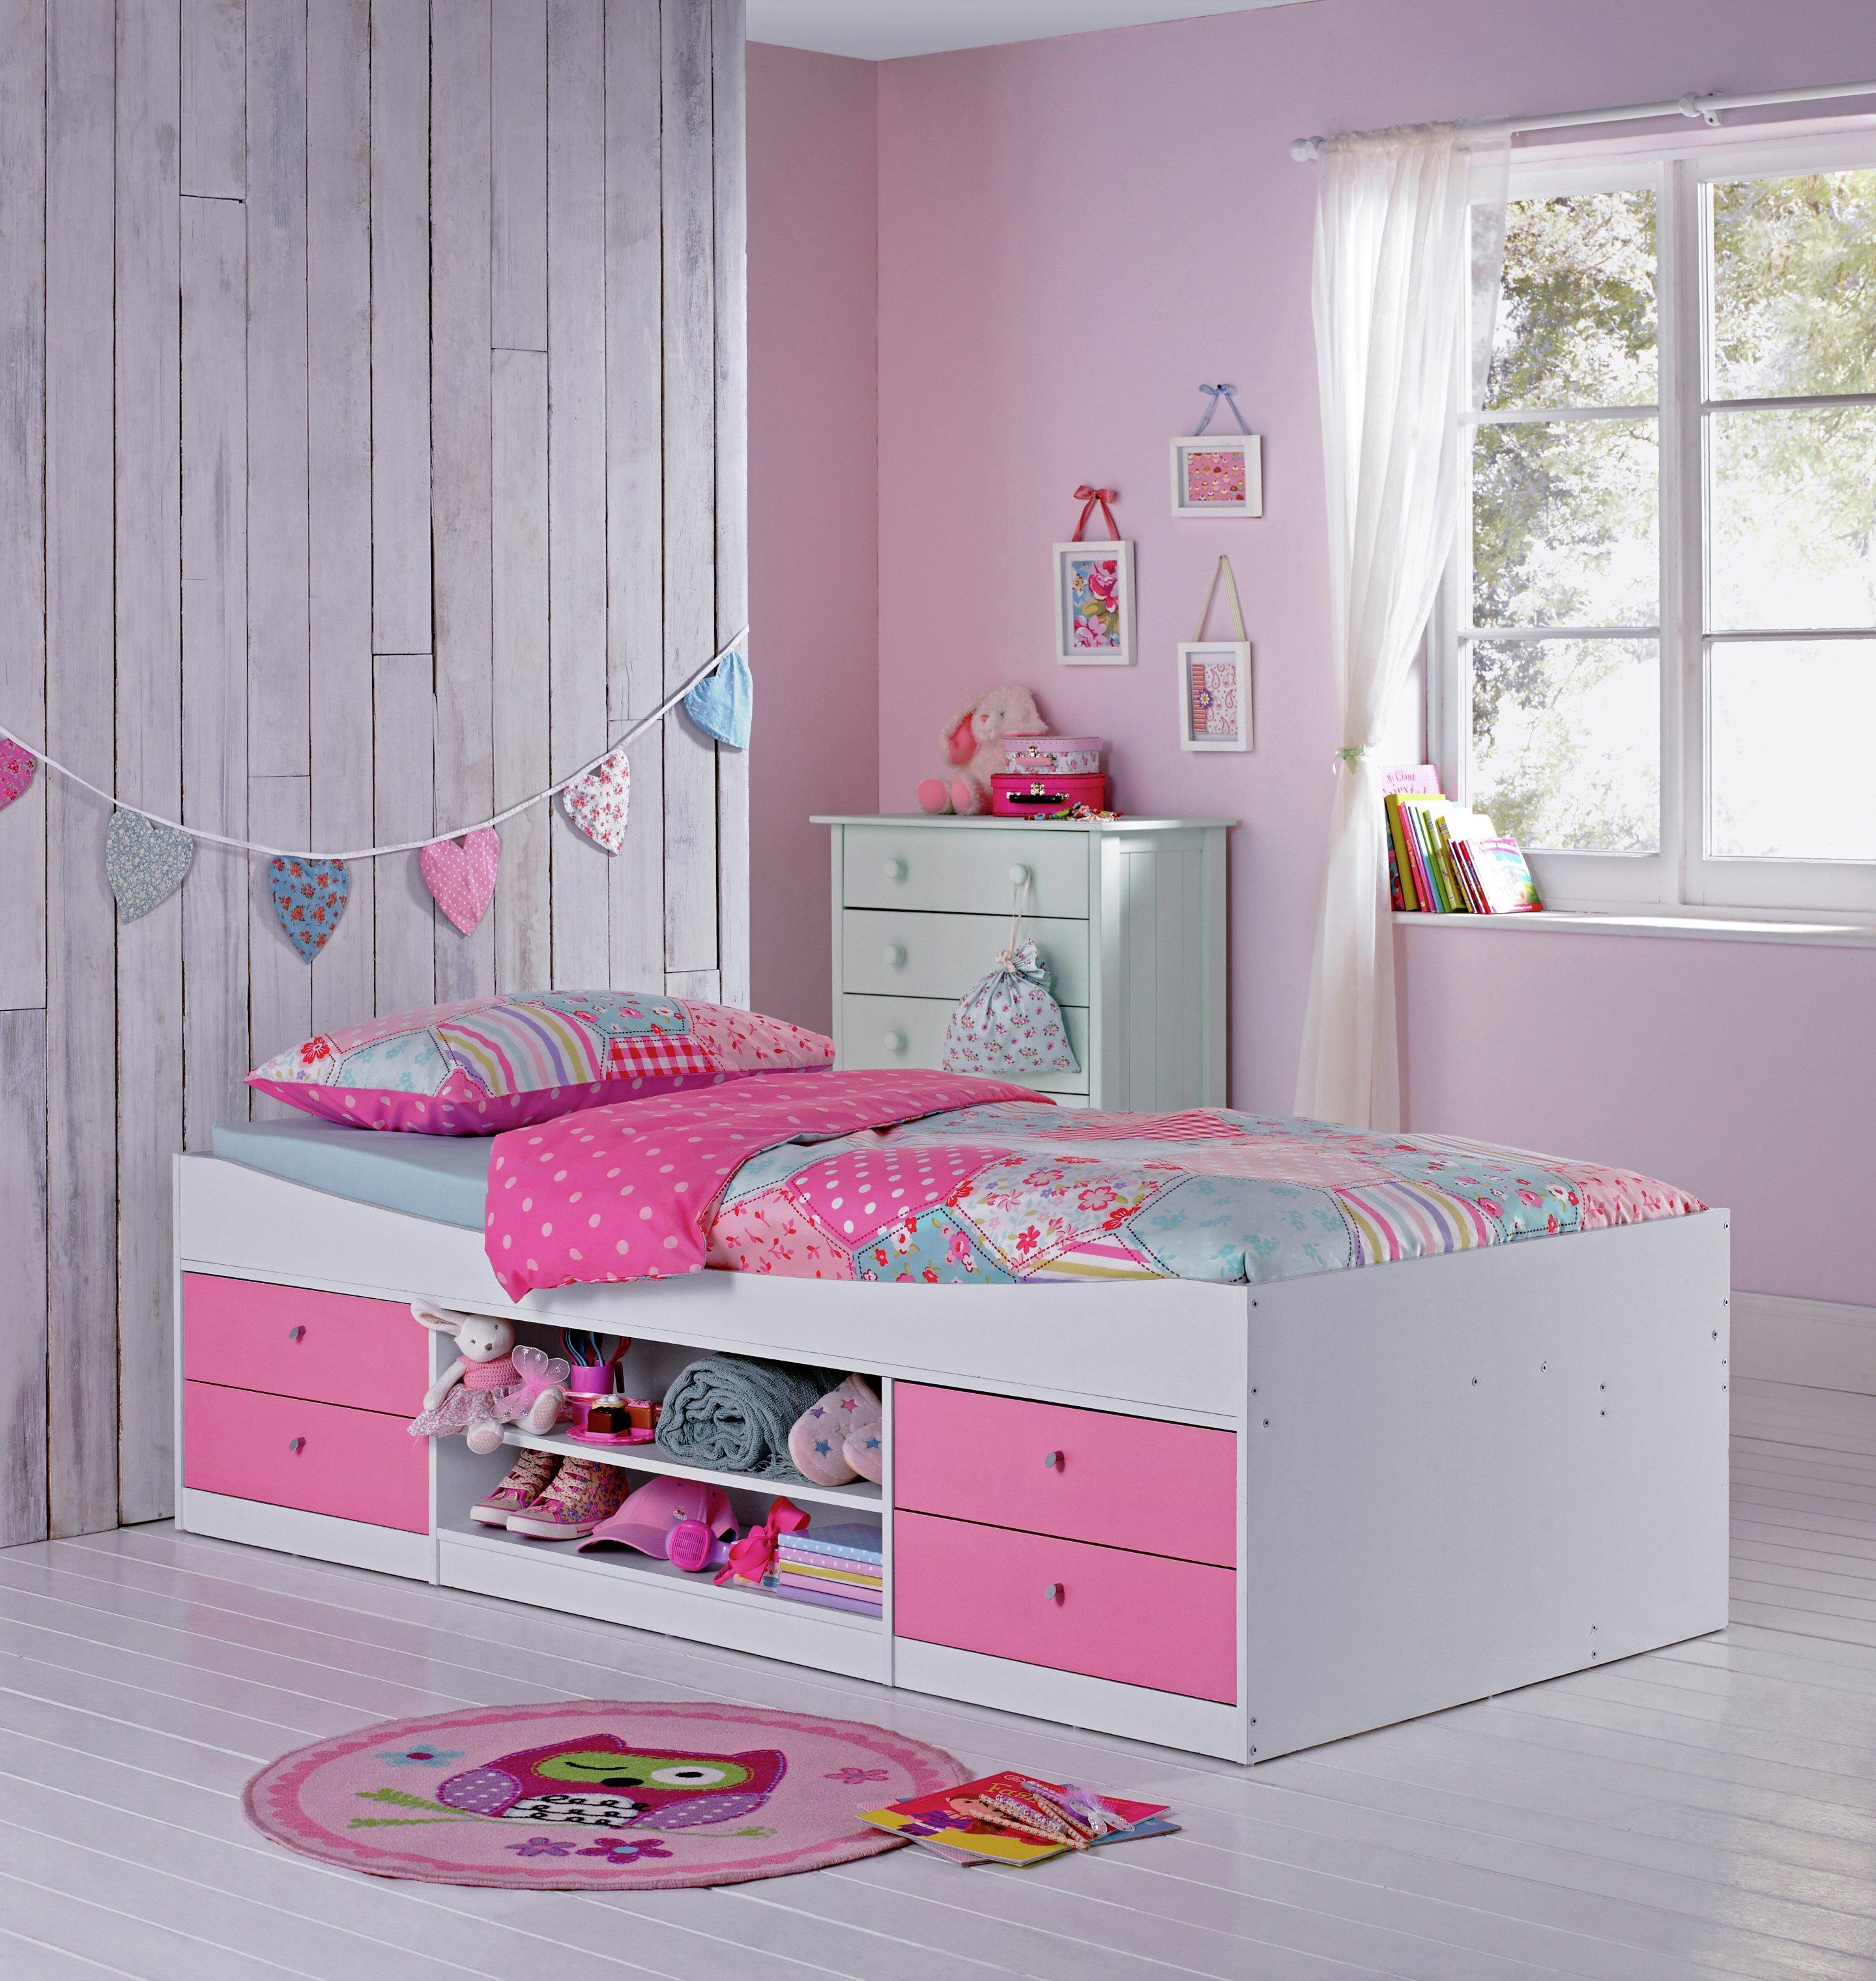 Argos Home Malibu Pink & White Cabin Bed Frame